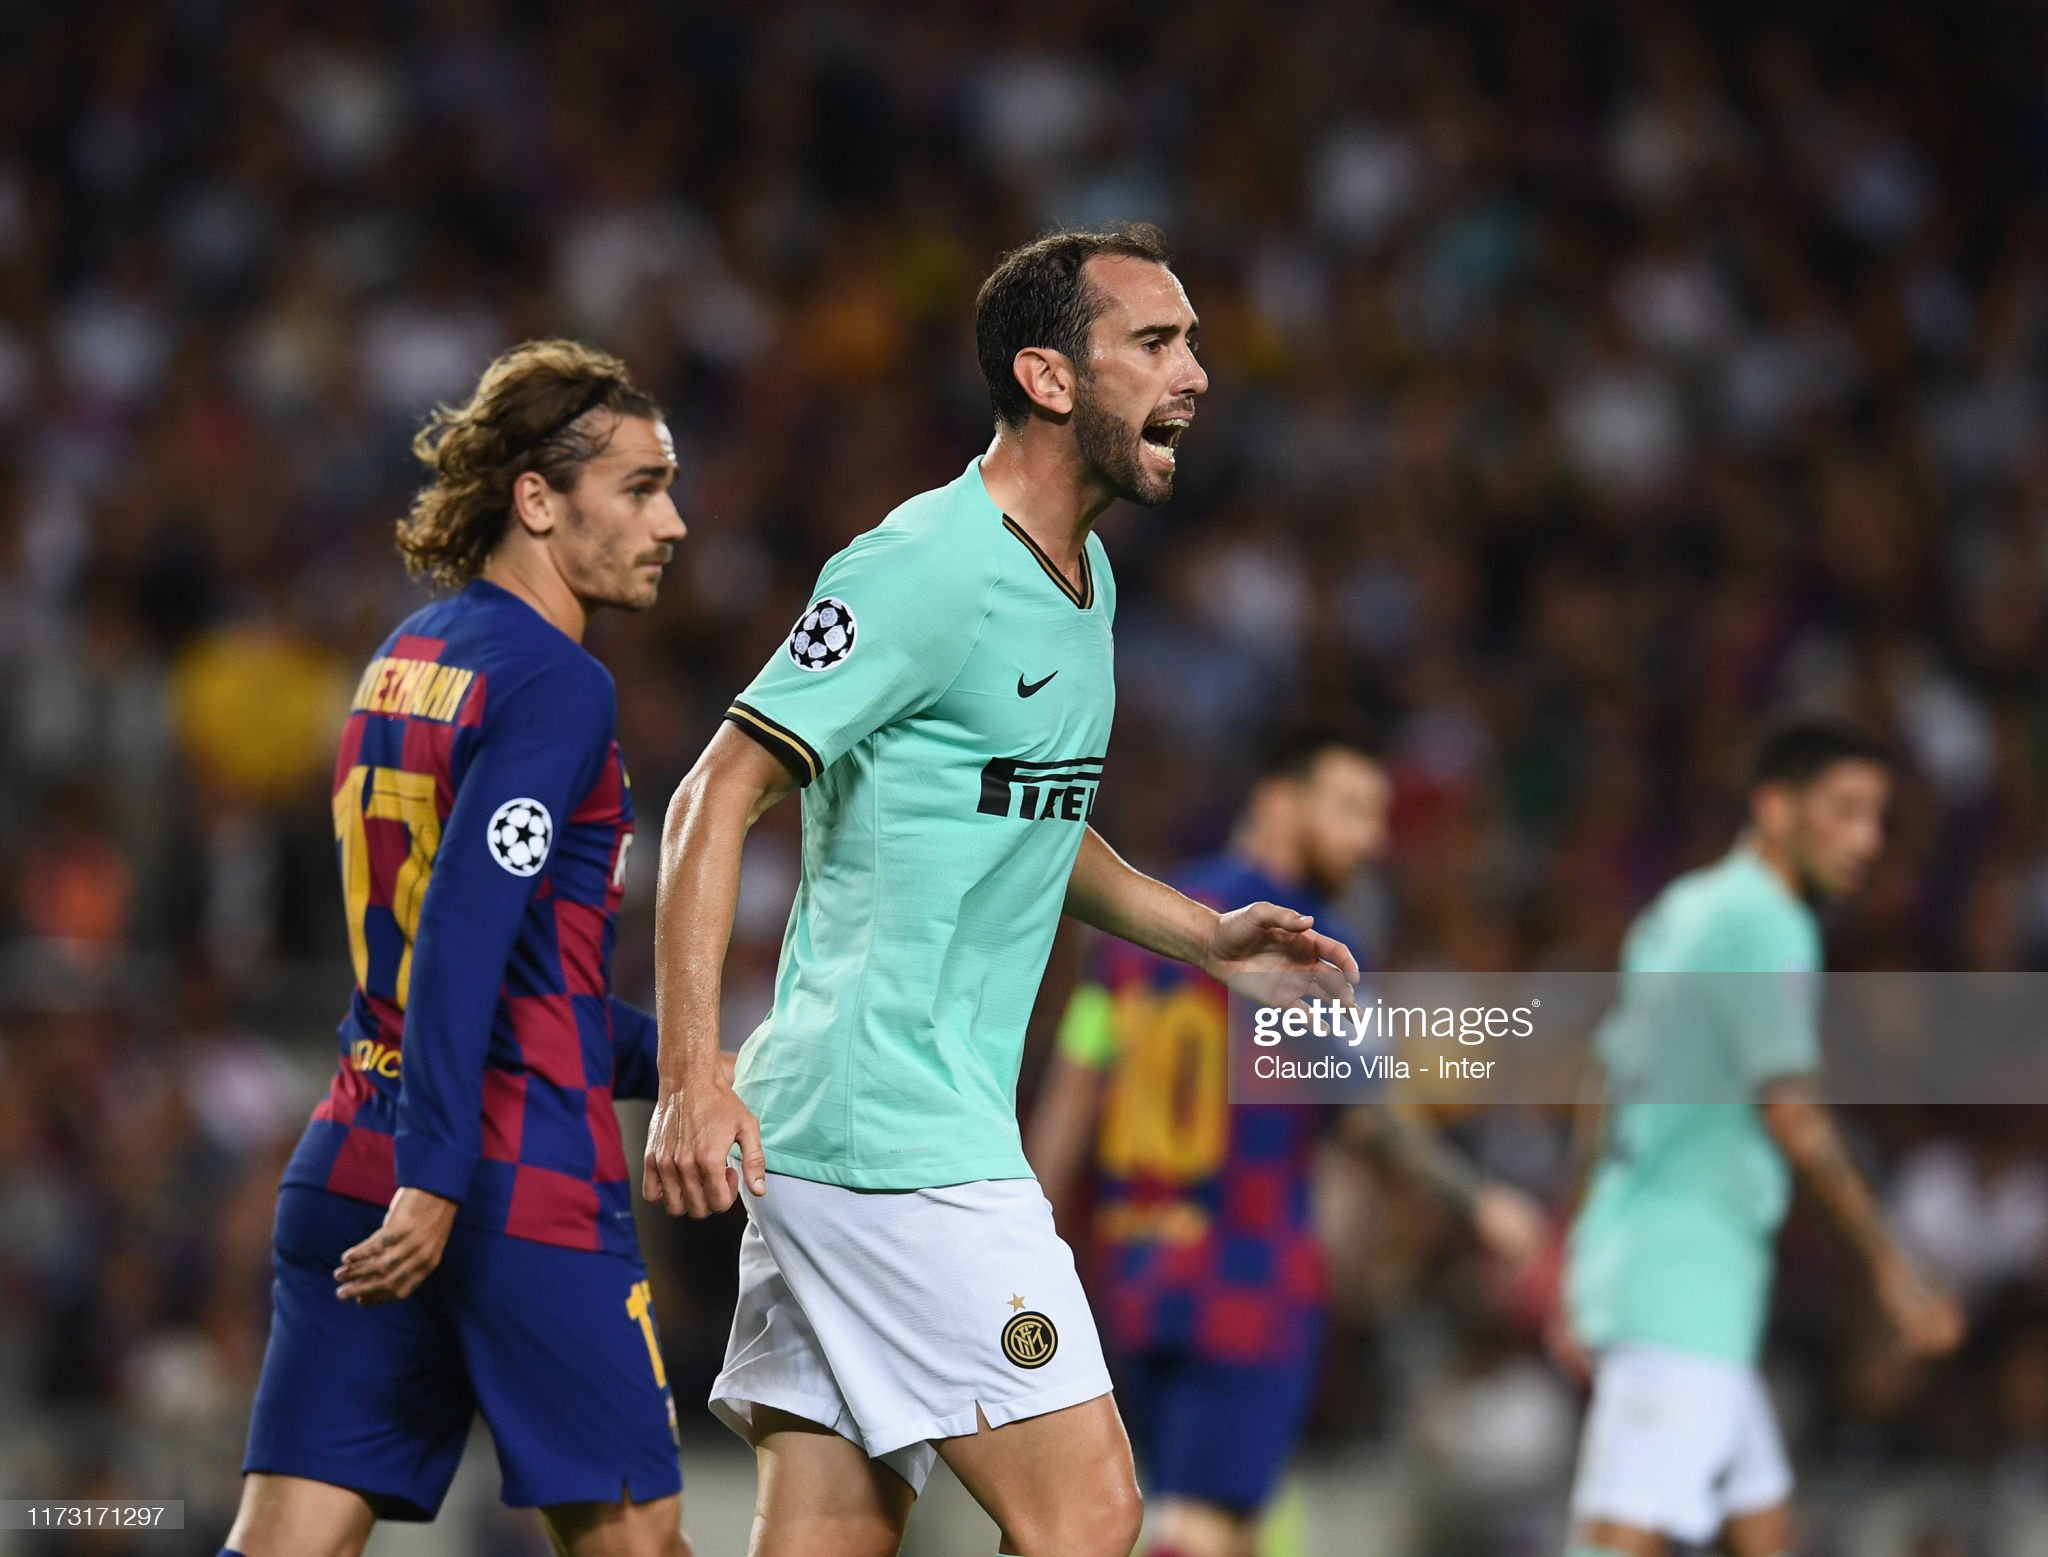 صور مباراة : برشلونة - إنتر 2-1 ( 02-10-2019 )  Diego-roberto-godn-leal-of-fc-internazionale-reacts-during-the-uefa-picture-id1173171297?s=2048x2048